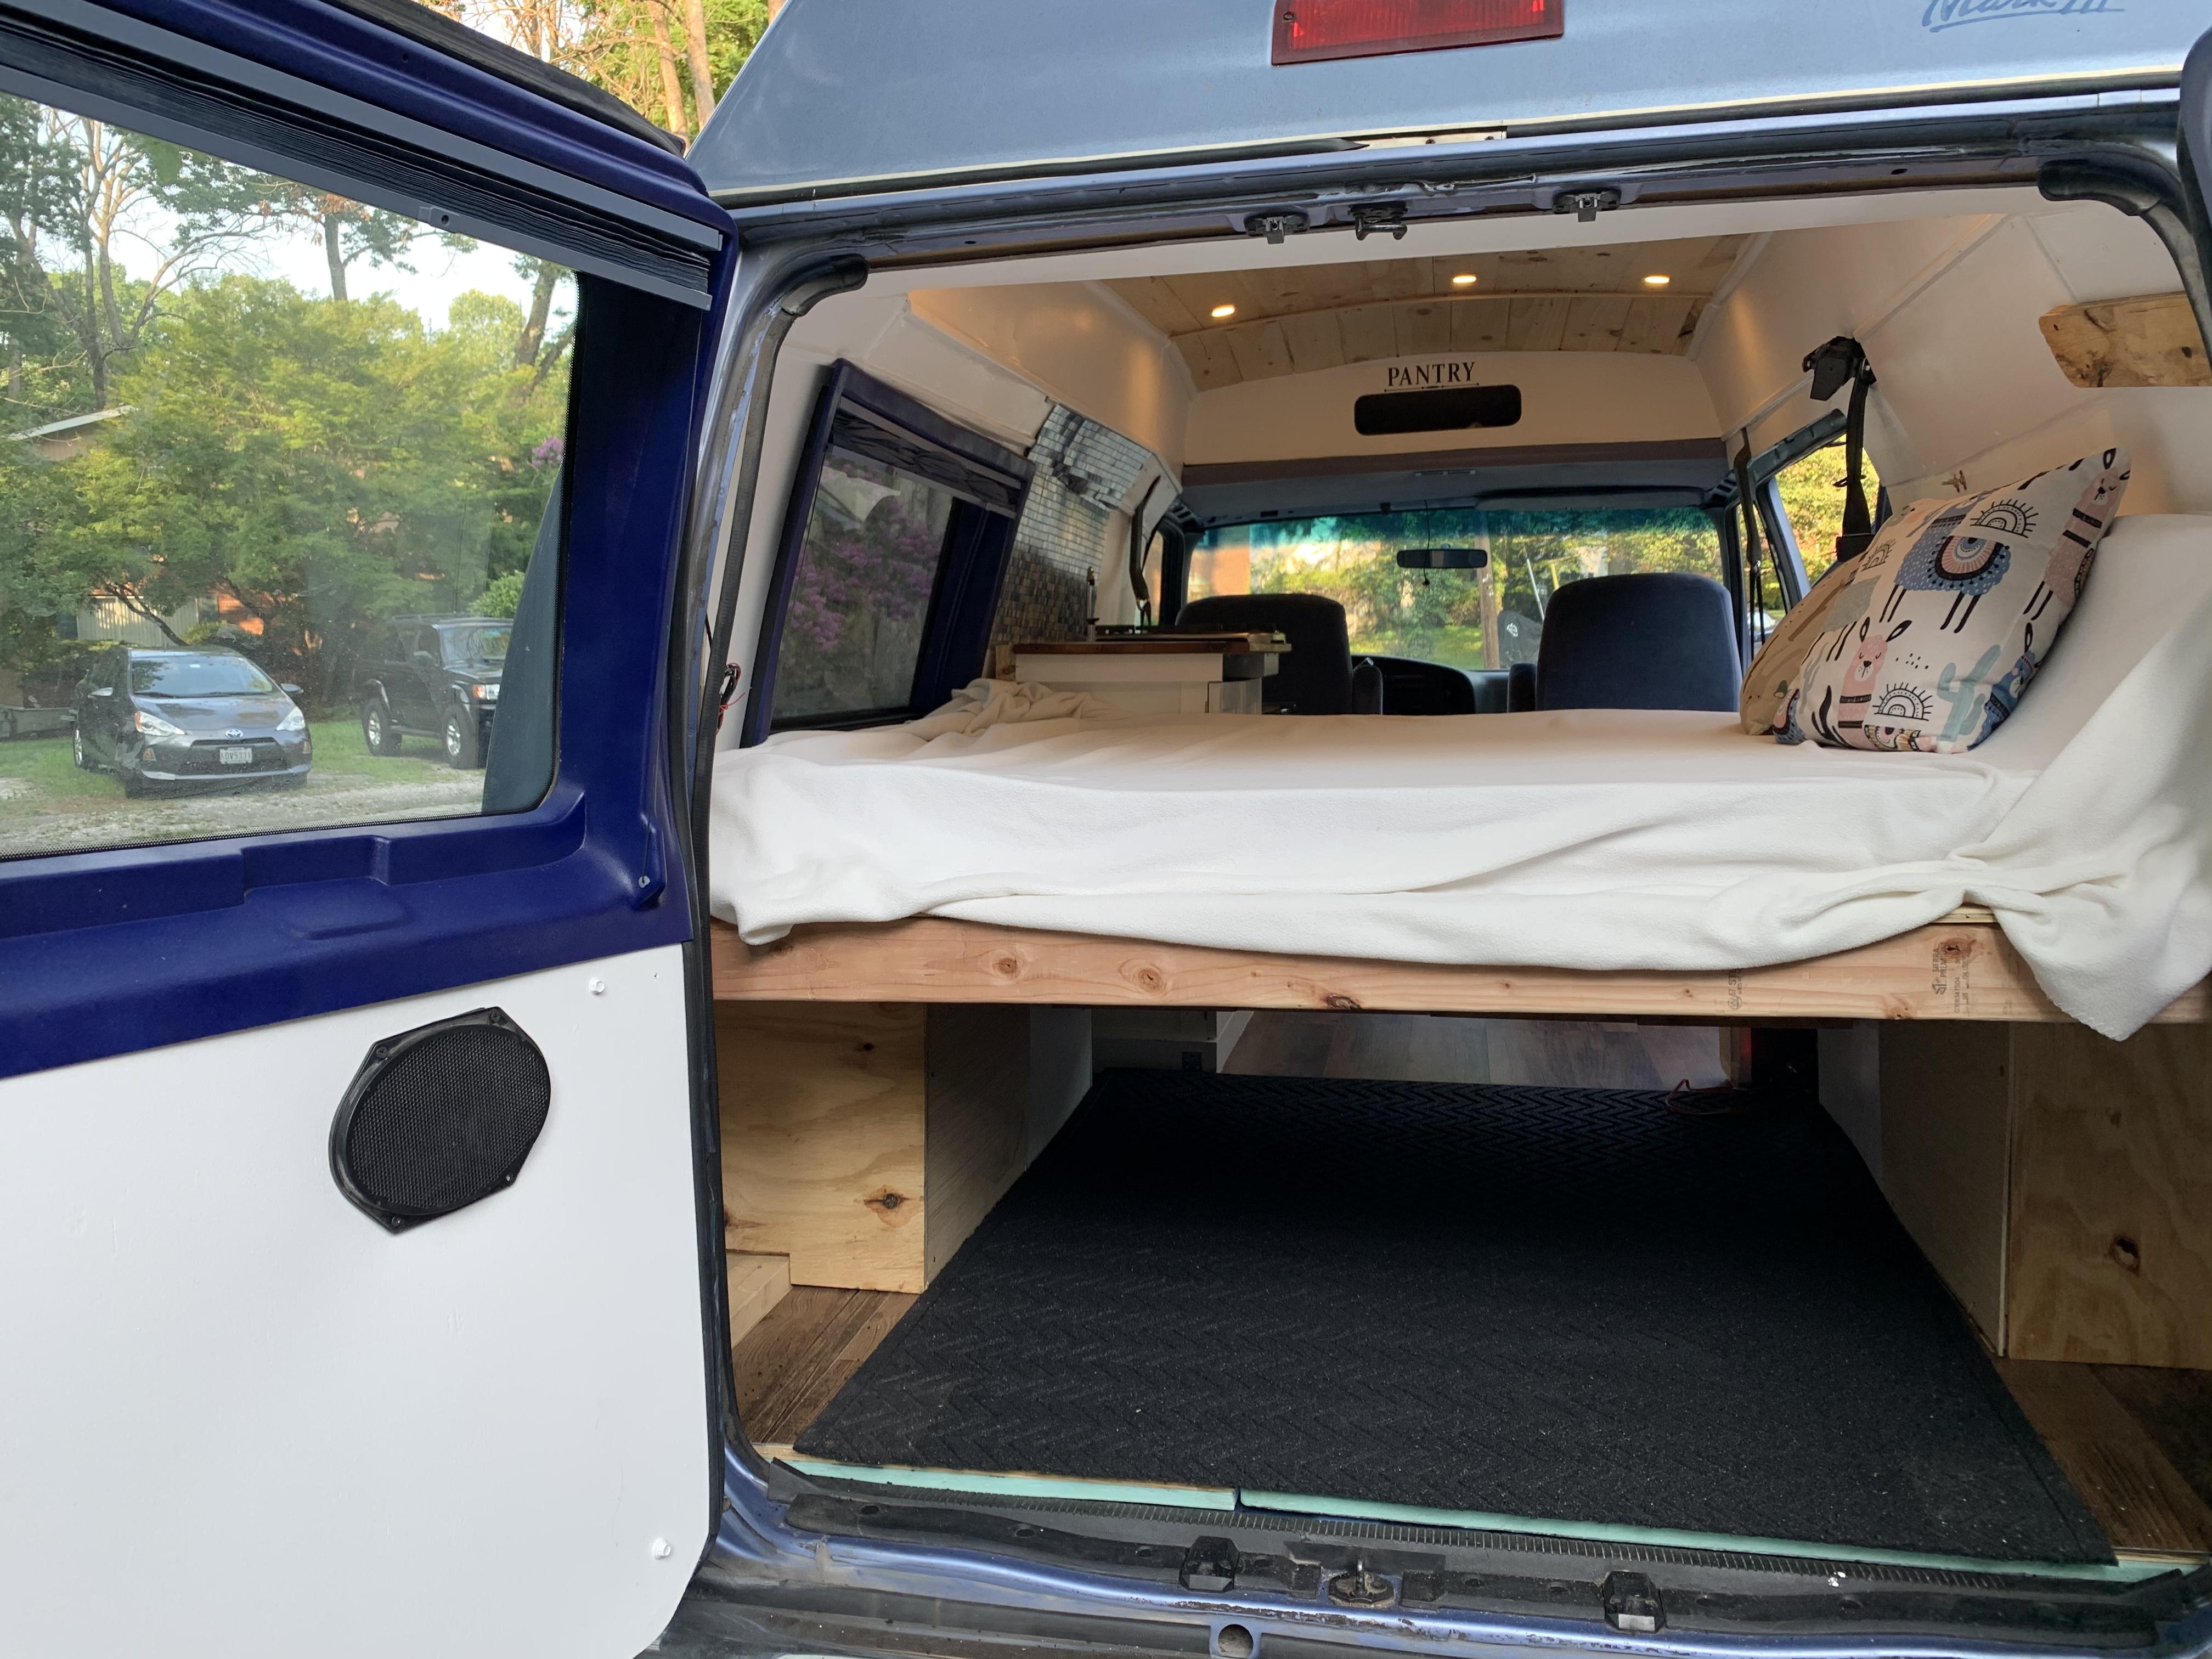 Back of van shows storage under bed for gear.. Ford Econoline 1995